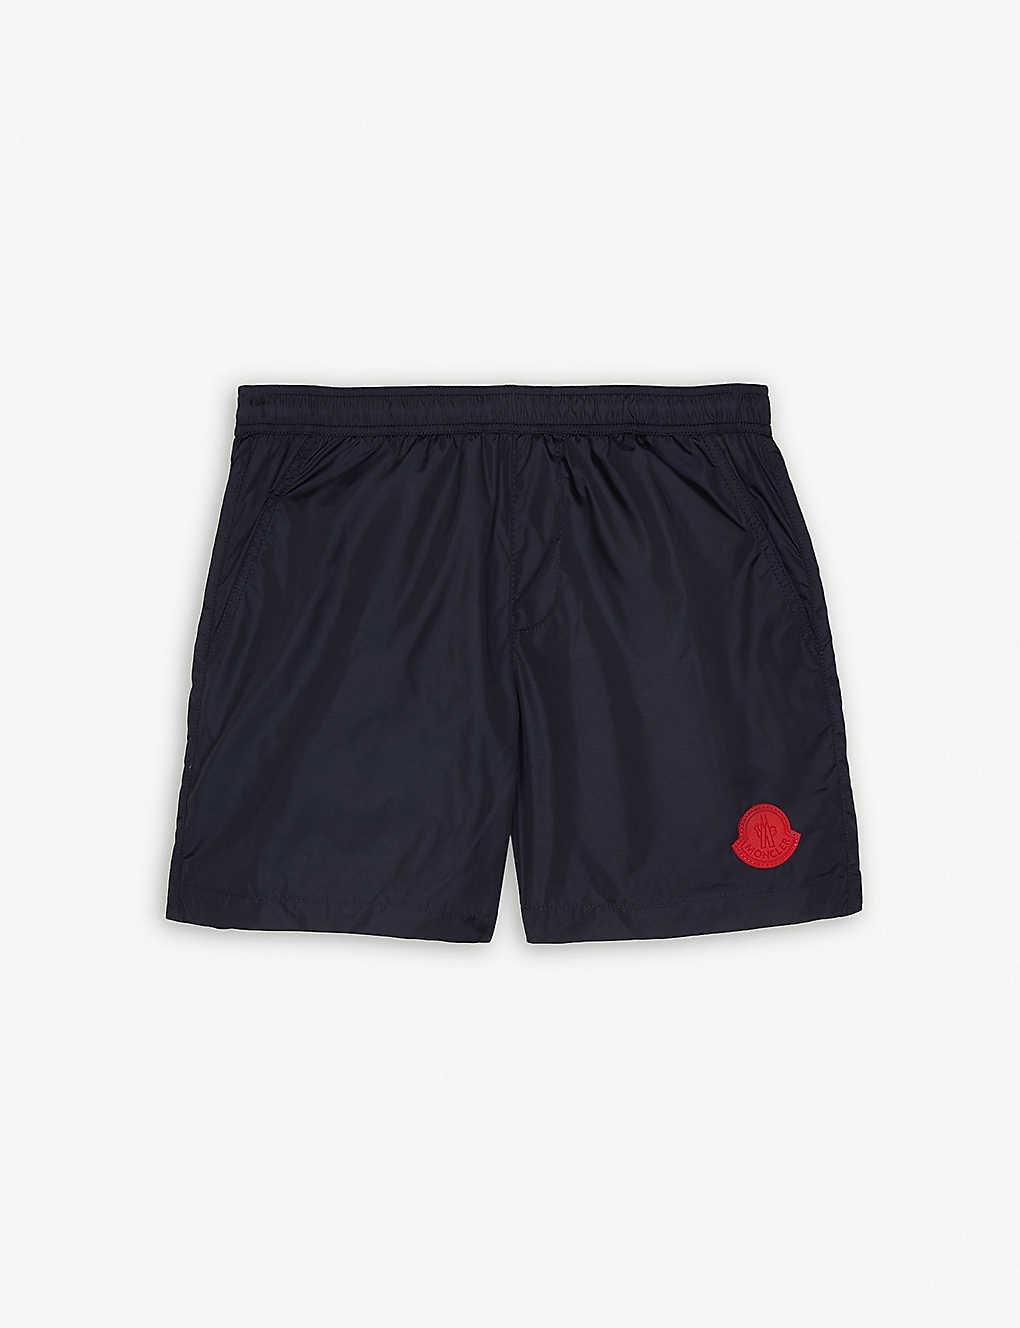 cb0cba0e5 MONCLER - Appliqué logo swim shorts 4-14 years | Selfridges.com